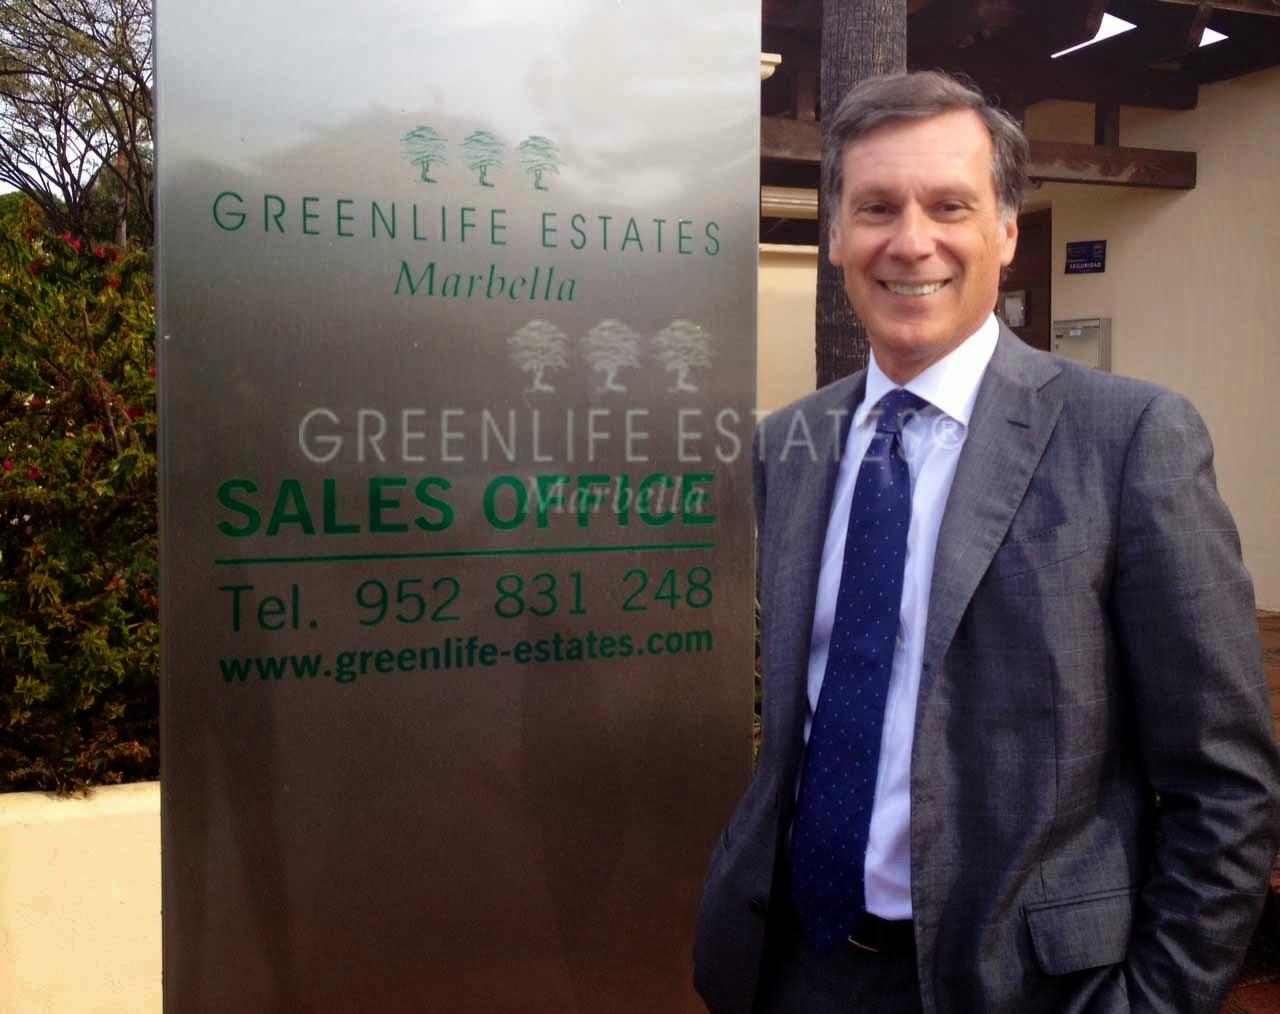 Empresario Greenlife estates Massimo Filippa empresario